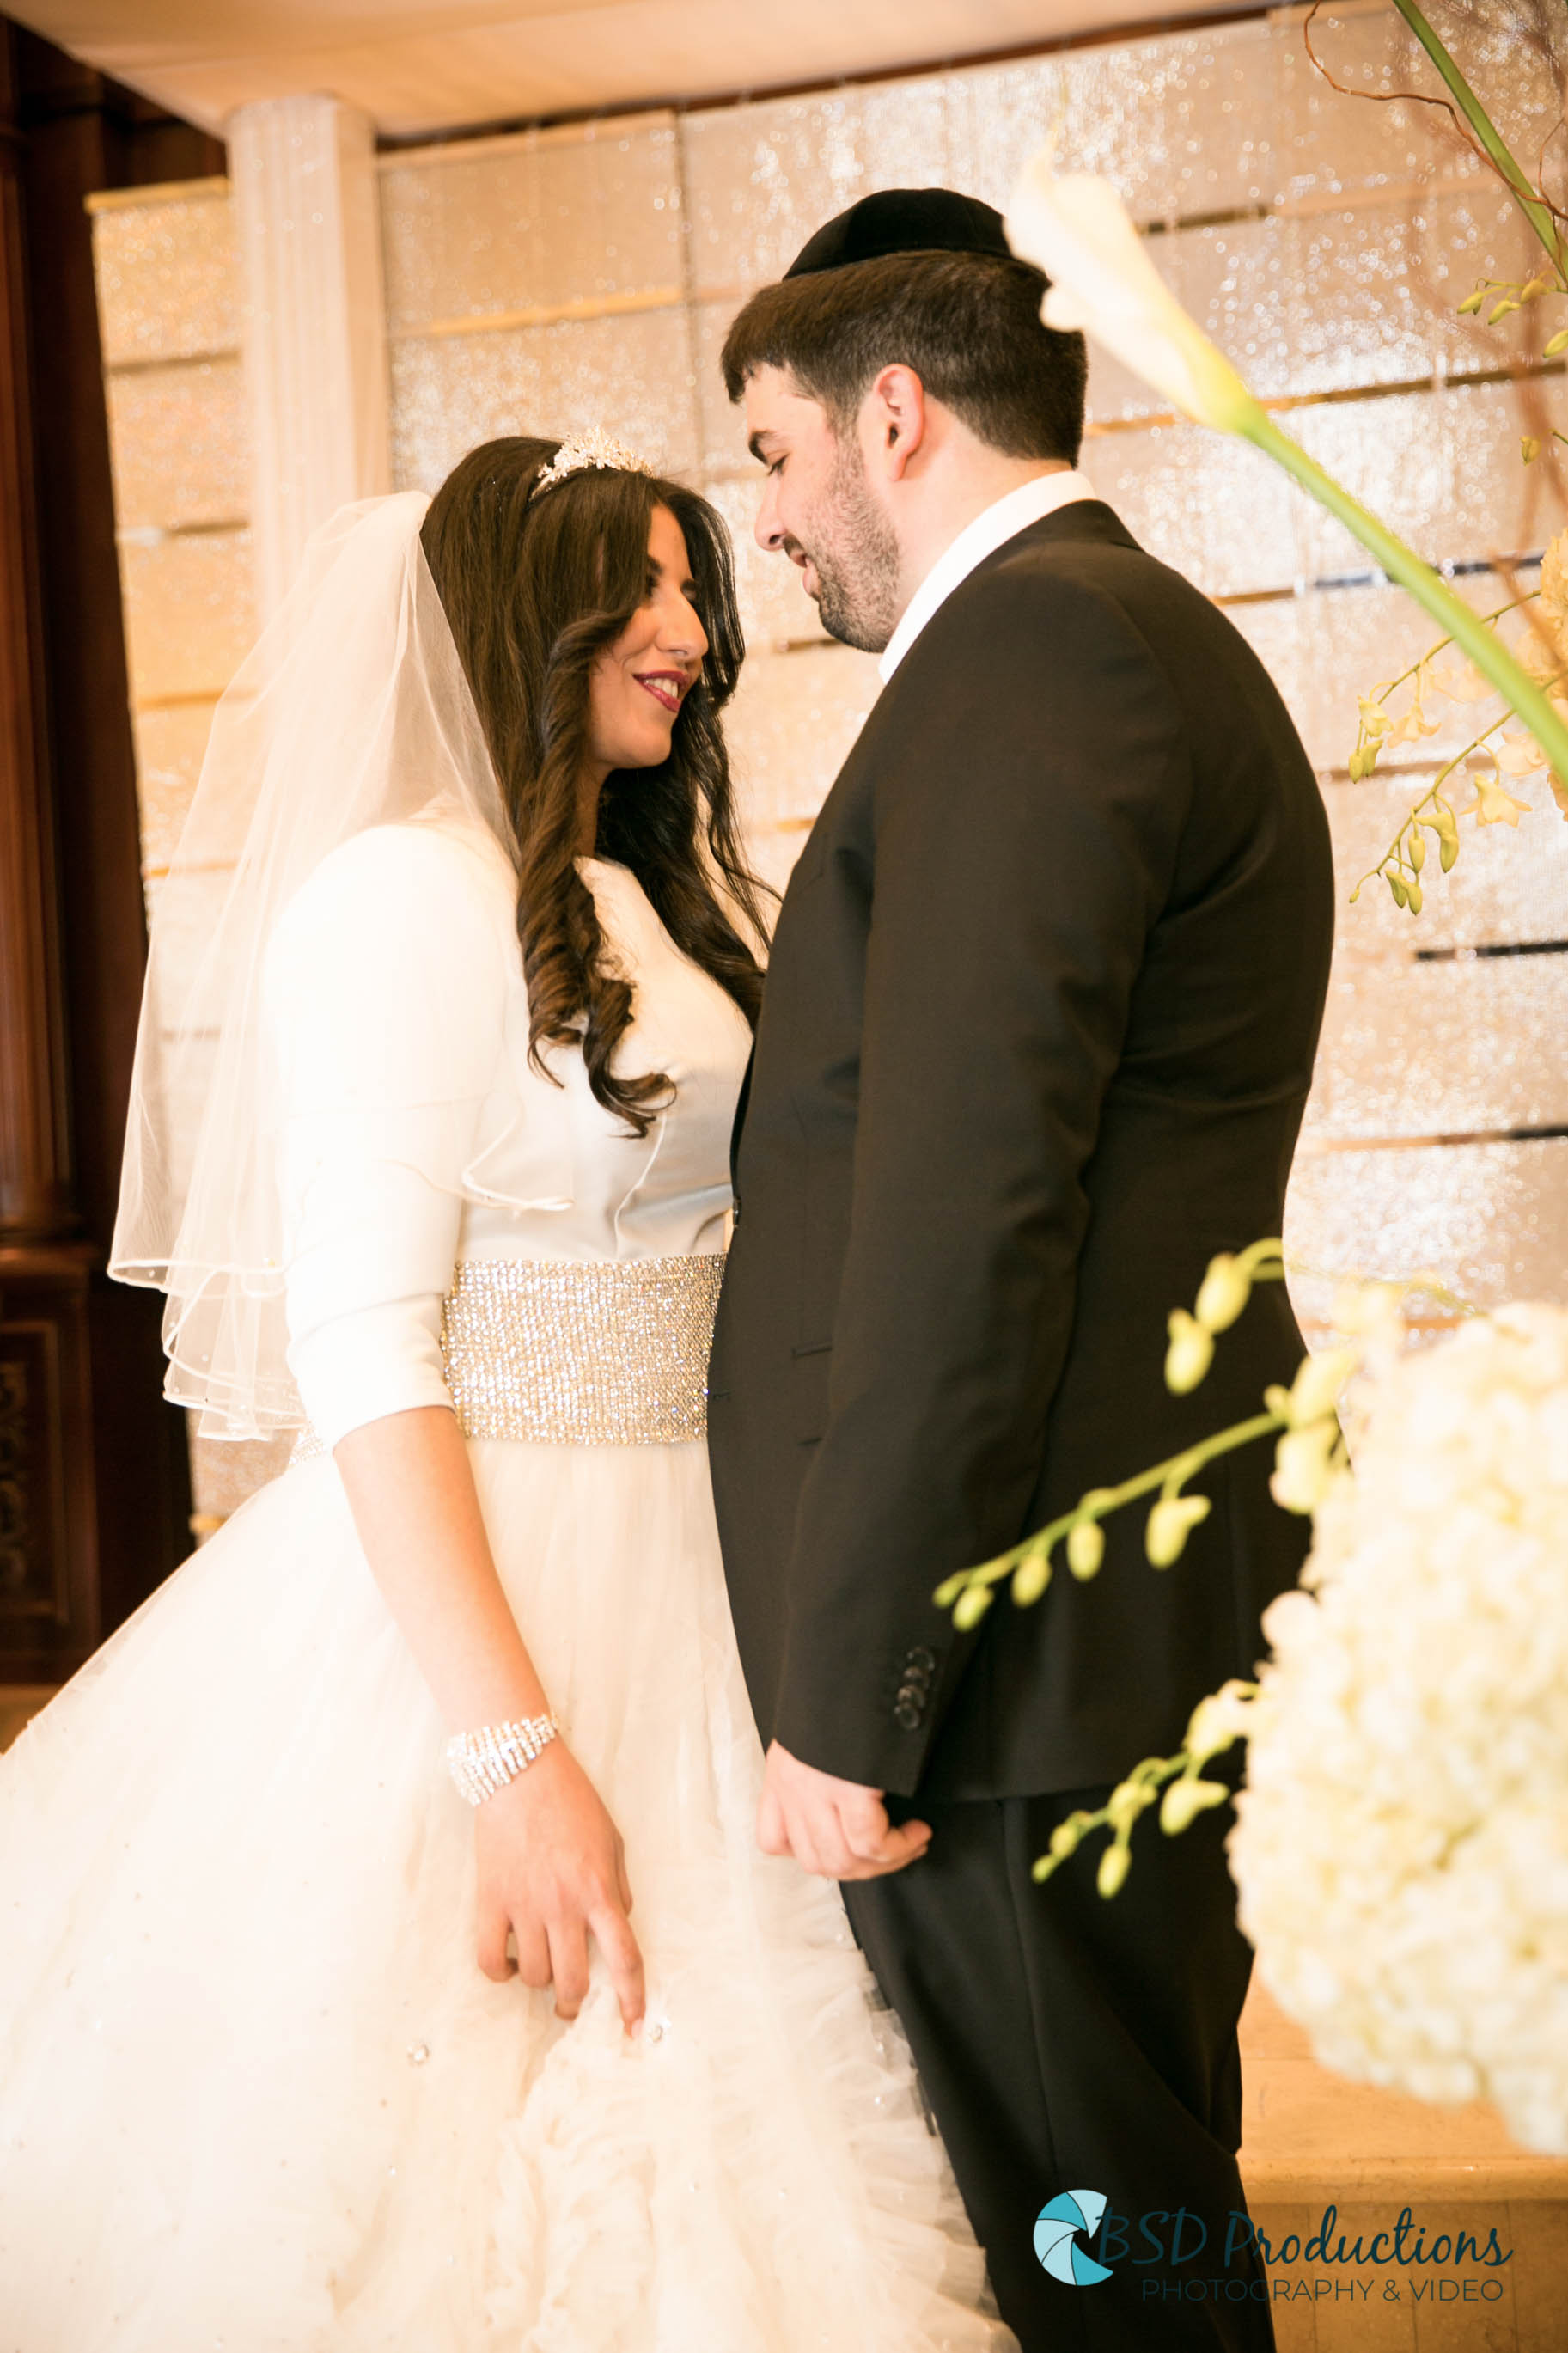 DAV_4752 Wedding – BSD Productions Photography